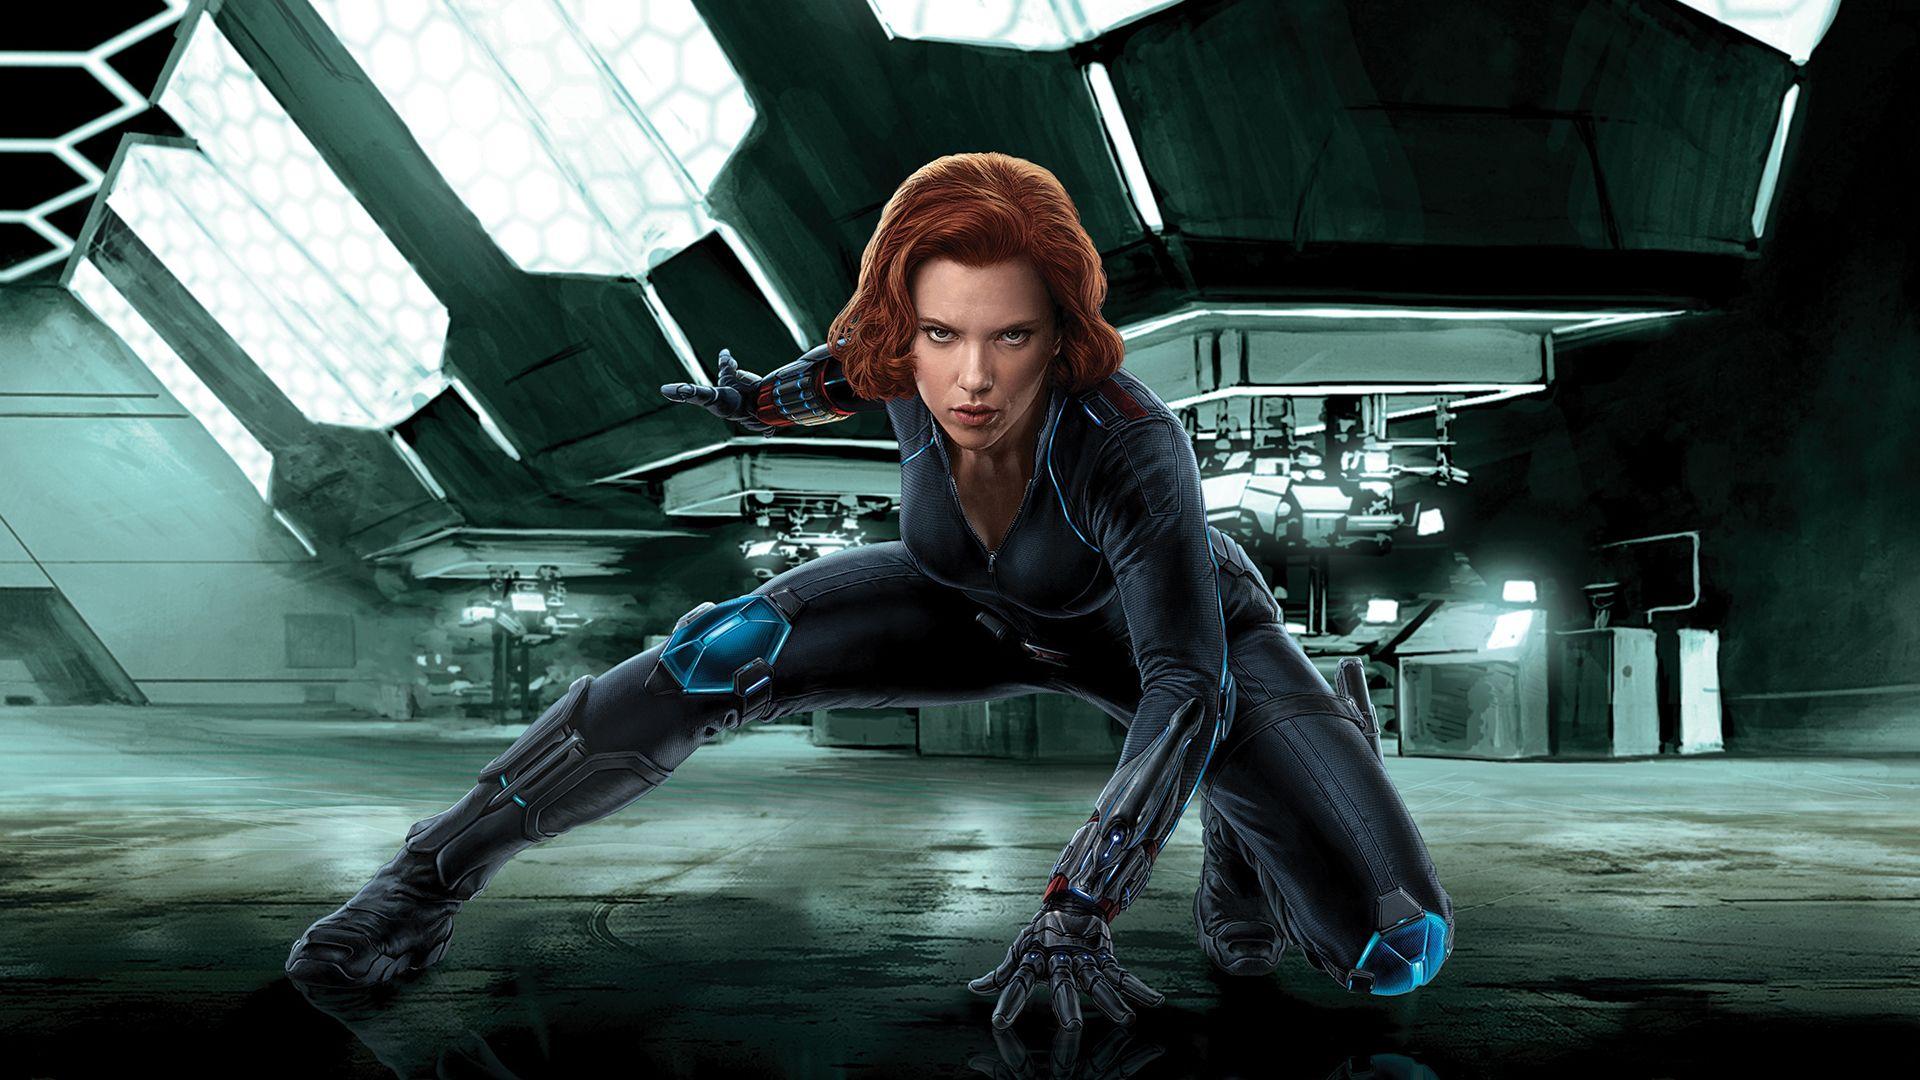 Black Widow Avengers Movie Wallpapers Black Widow Avengers Black Widow Wallpaper Black Widow Marvel